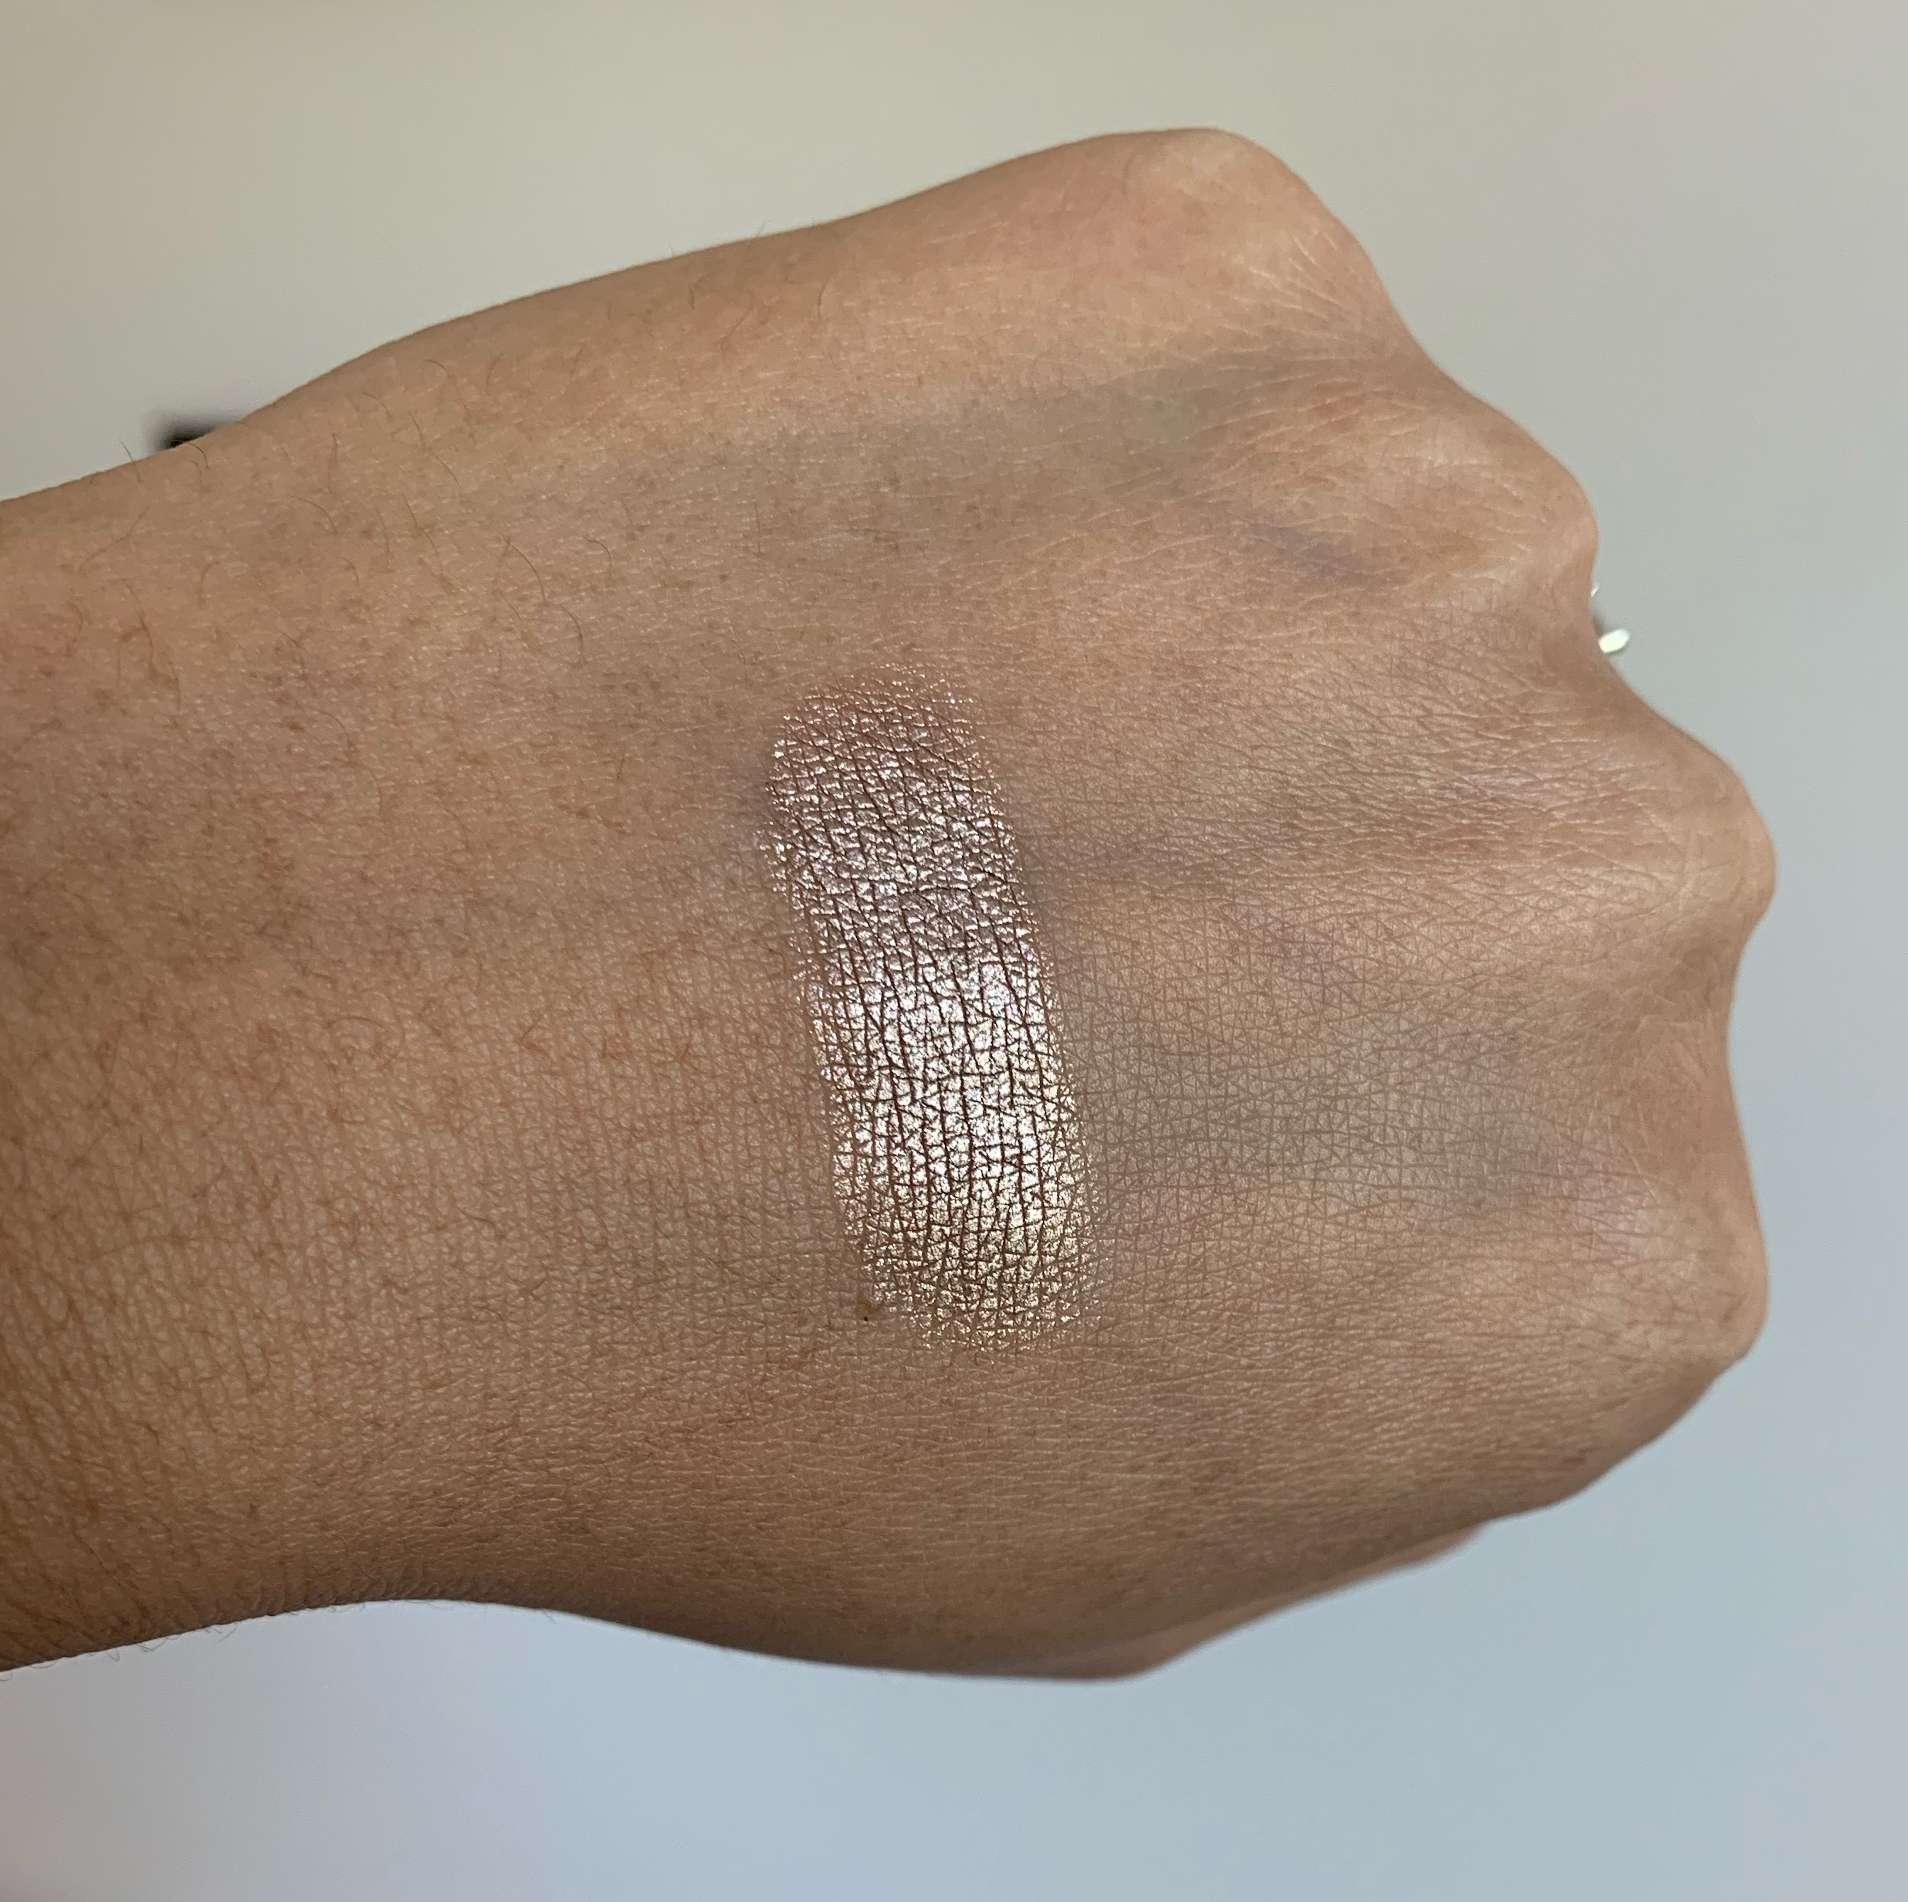 L'Oreal Infallible 24HR Eyeshadow 890 Bronzed Taupe Swatch on Medium Dark Skin